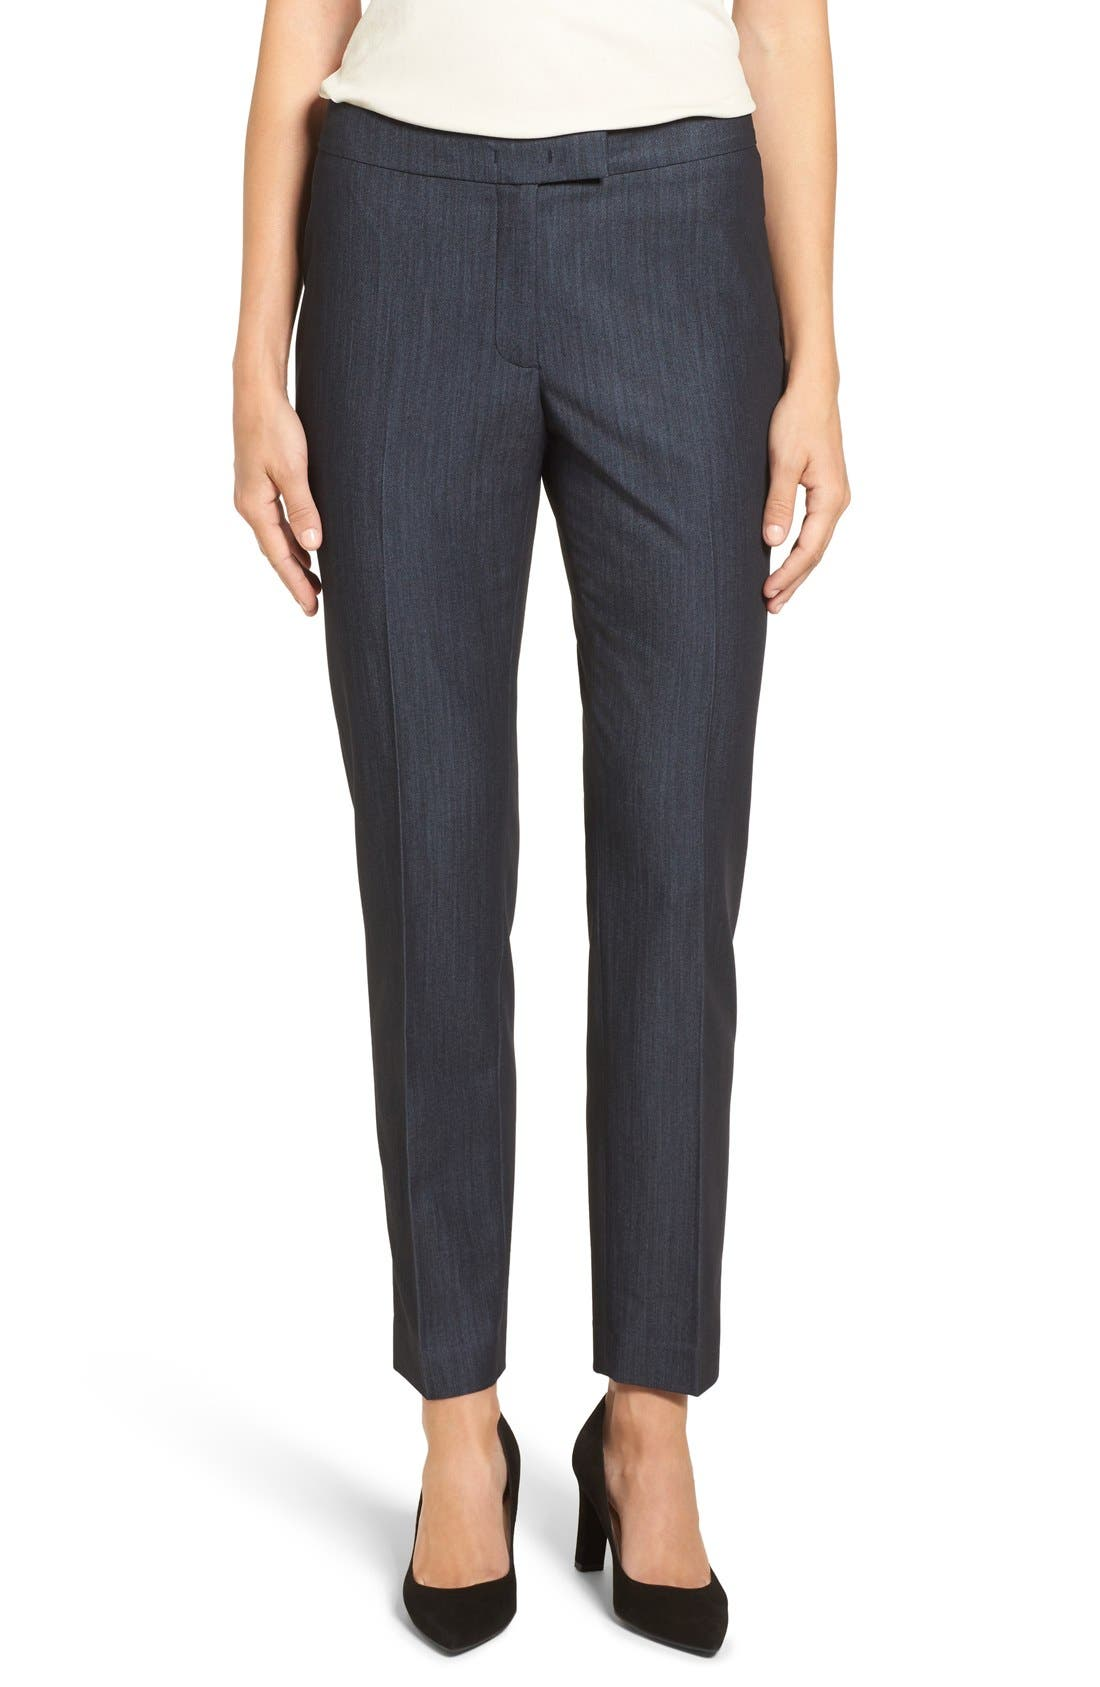 Alternate Image 1 Selected - Anne Klein Slim Stretch Denim Suit Pants